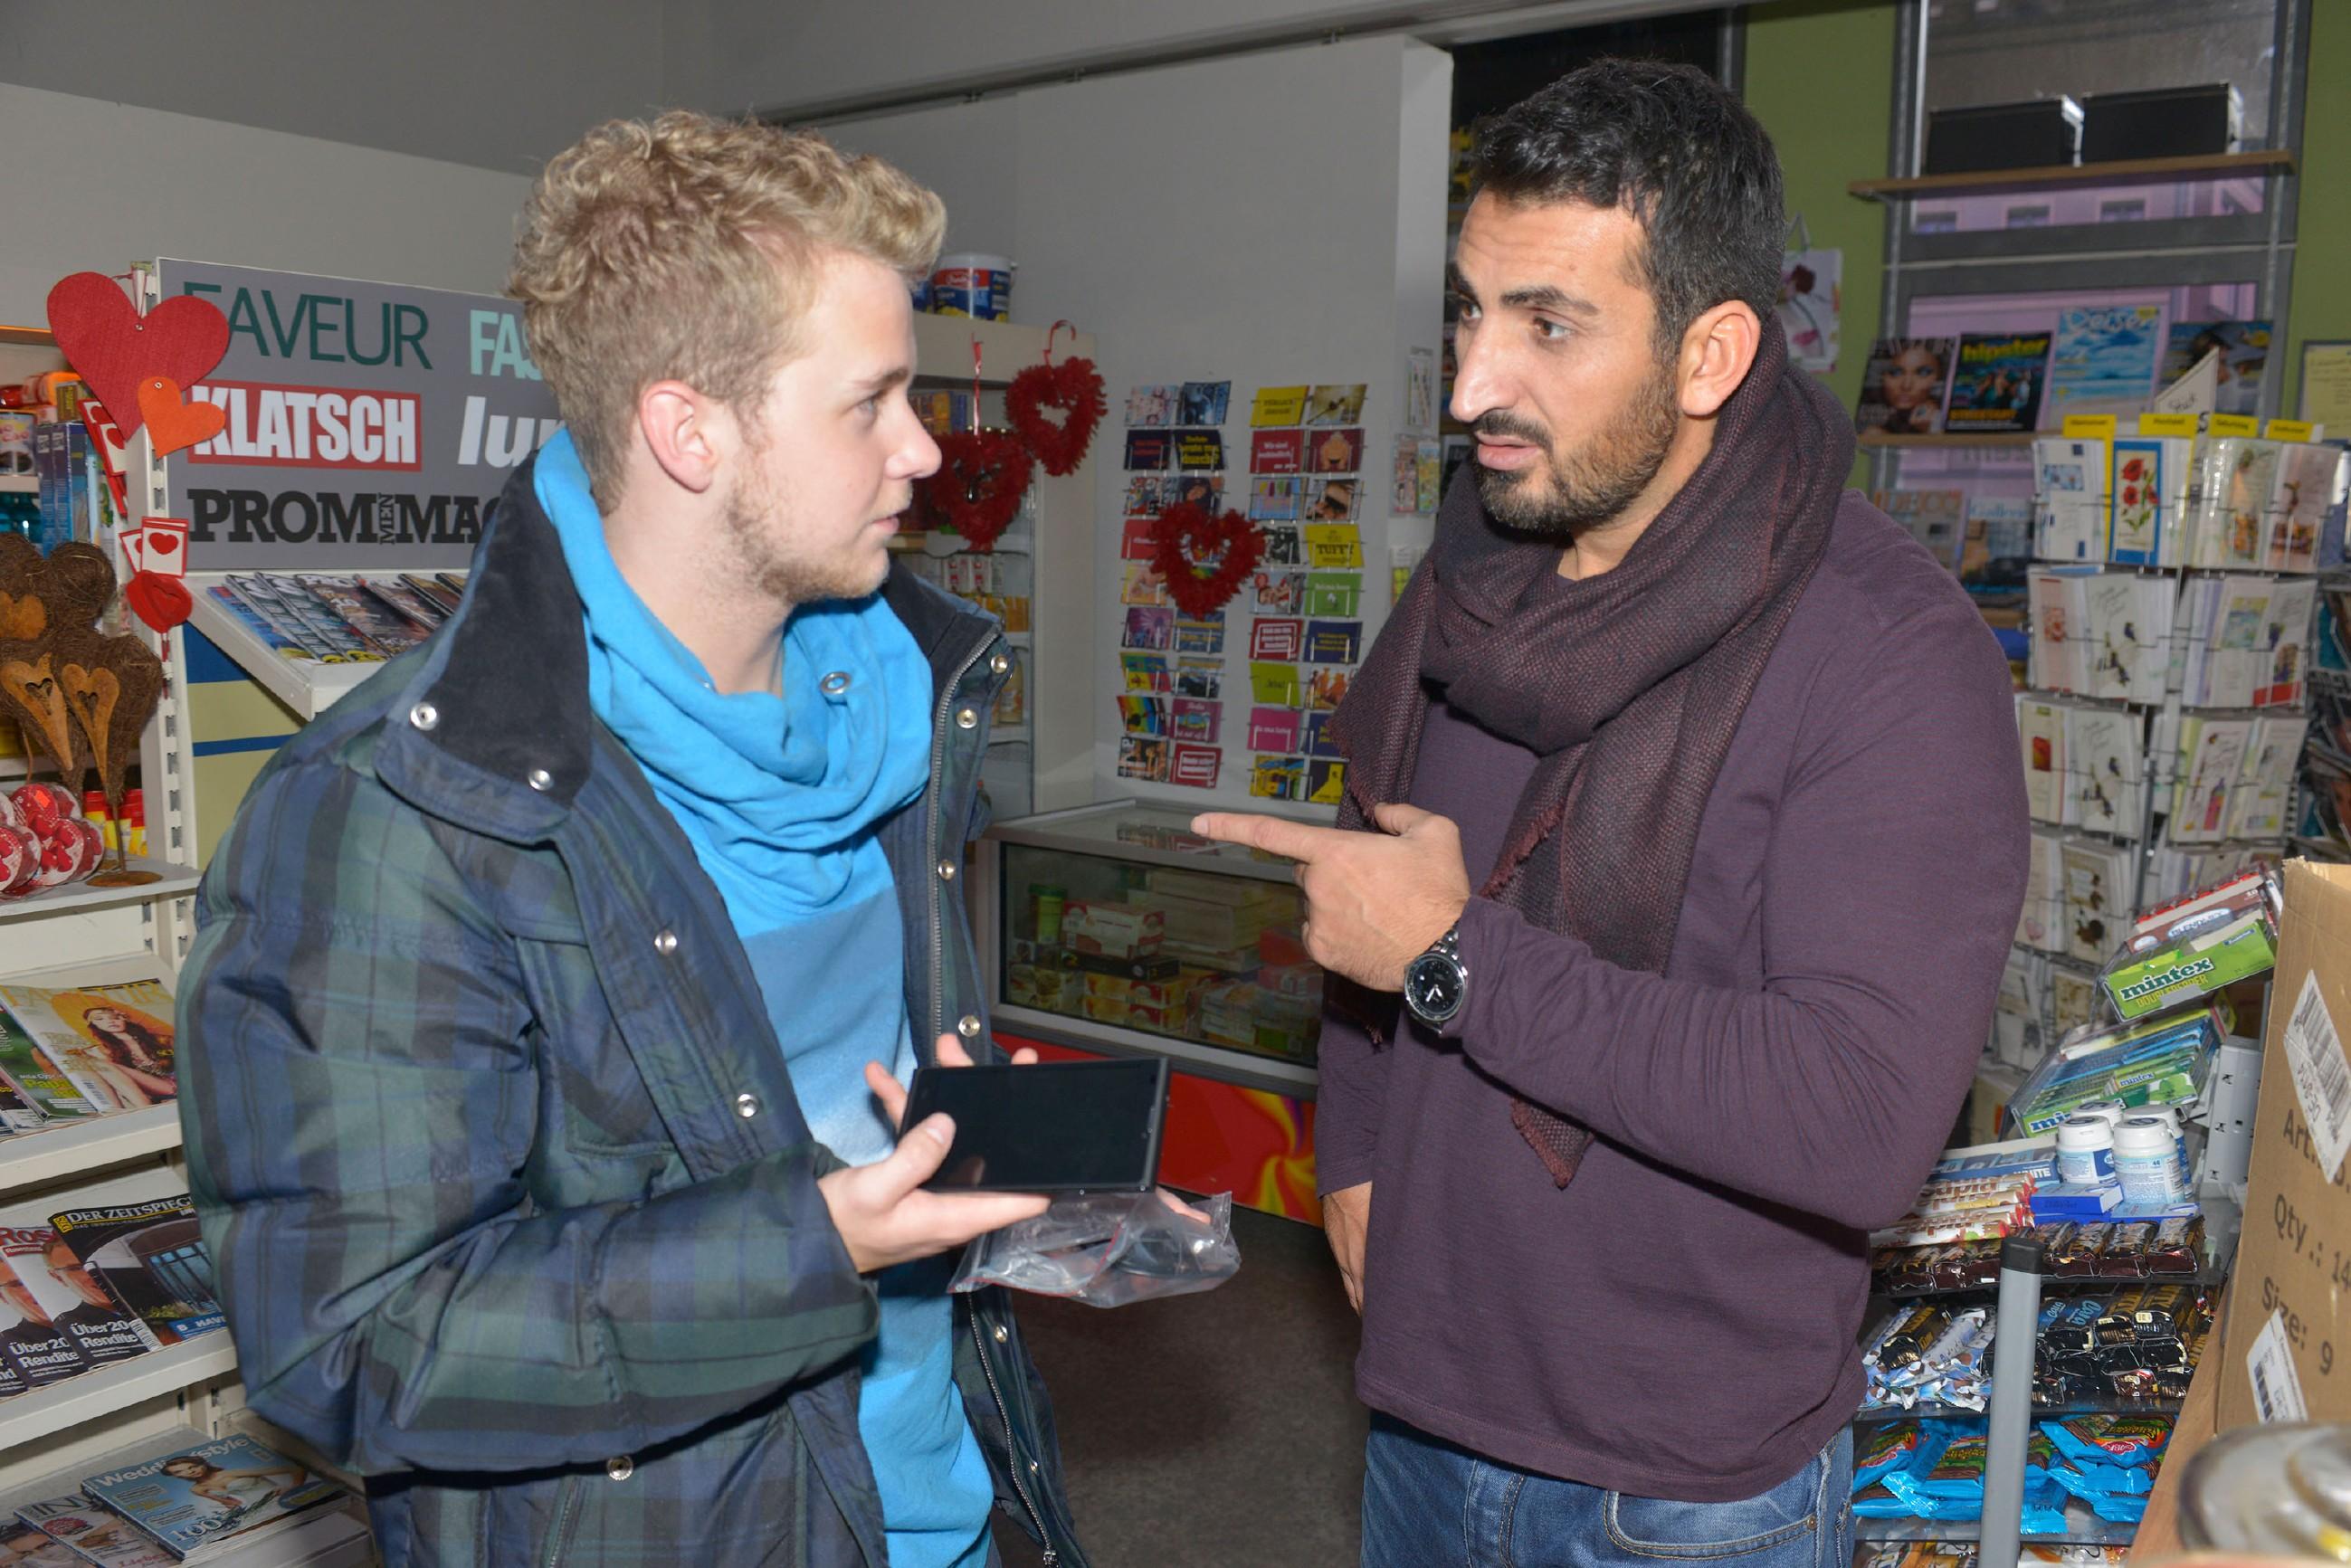 Mesut (Mustaf Alin, r.) warnt Jonas (Felix van Deventer) davor, mit den gefakten Handys zu handeln. (Quelle: RTL / Rolf Baumgartner)